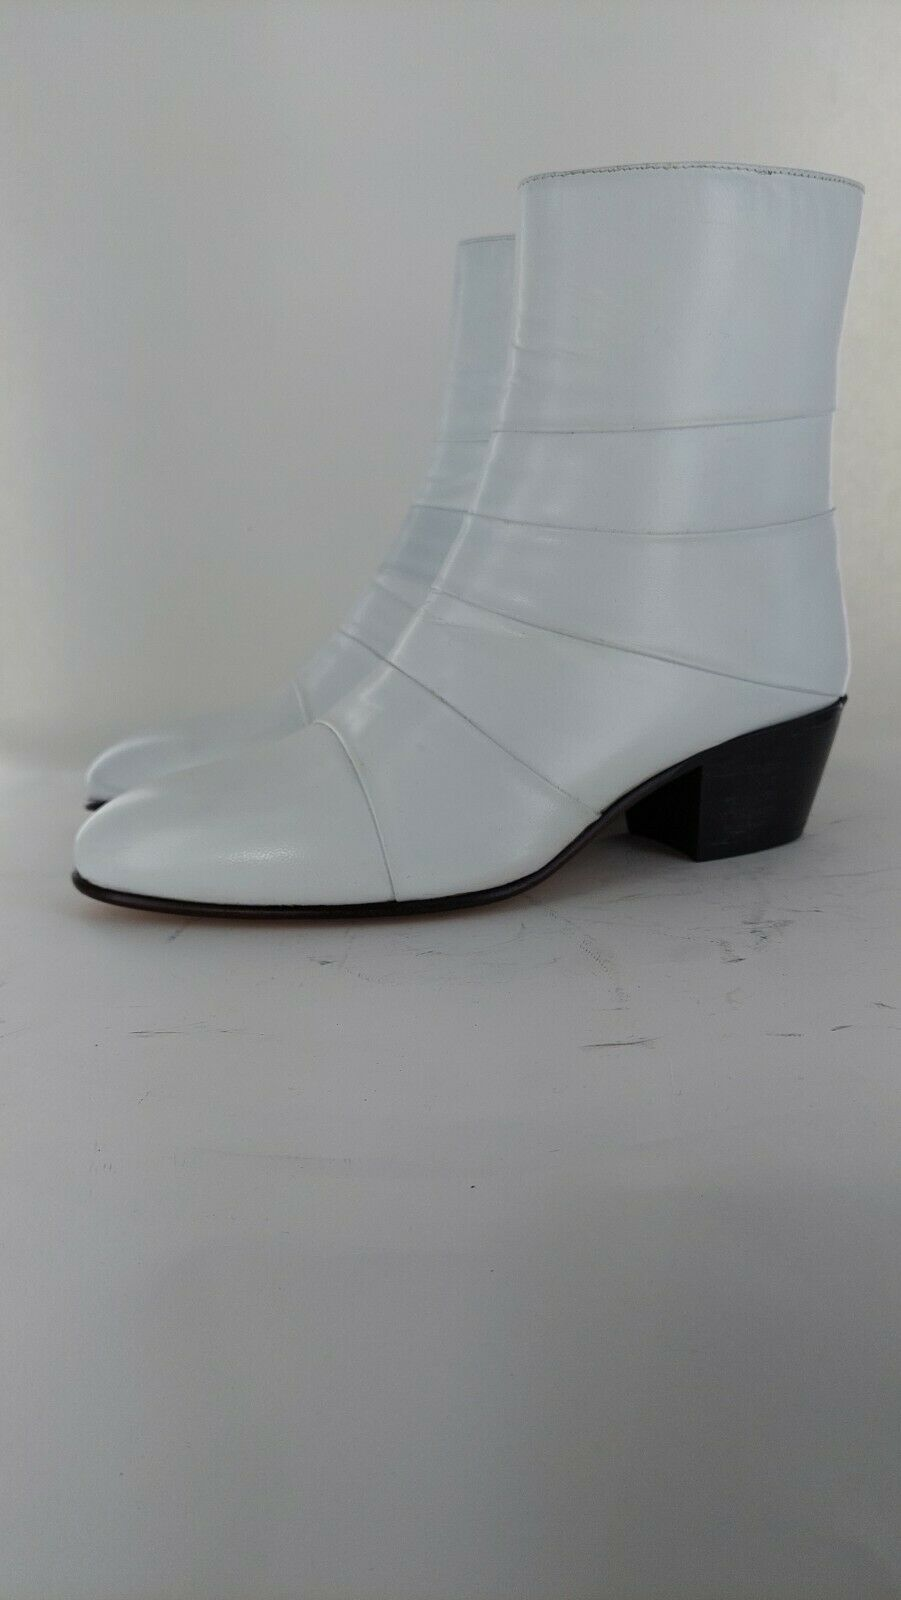 SHUPERB Mens Leather Smart Cuban Heel Ankle Boots UK Size 7#767